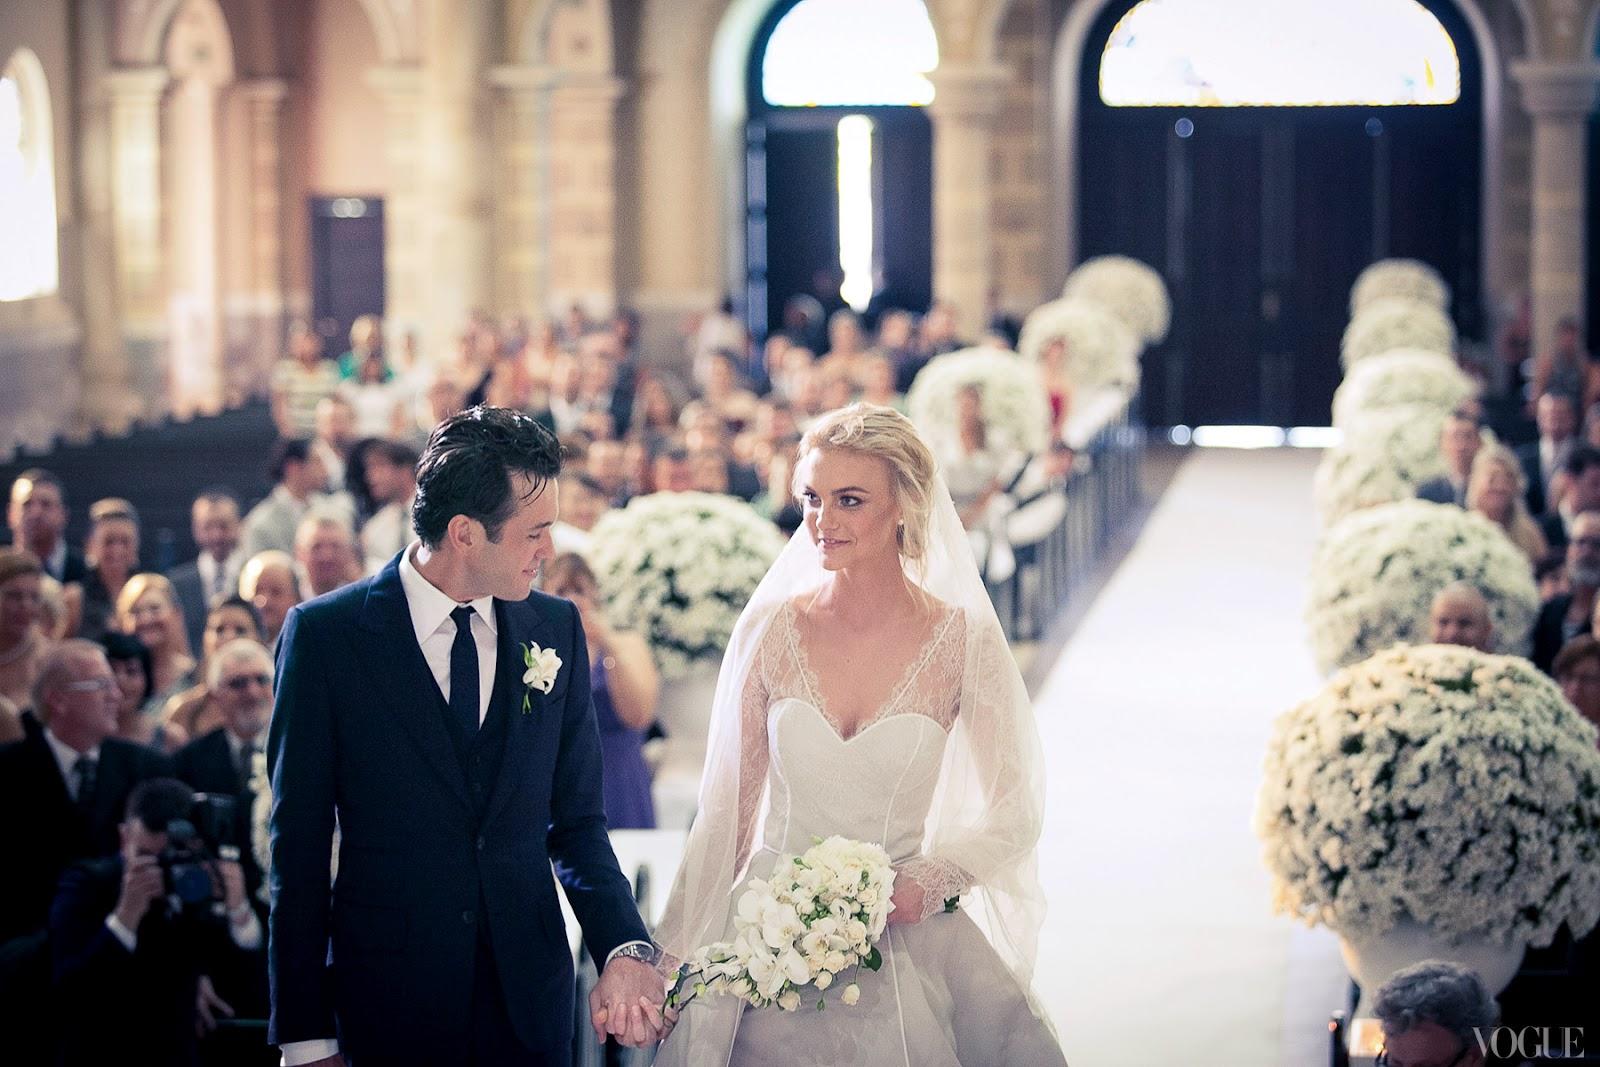 plum sykes wedding dress » Wedding Dresses Designs, Ideas and Photos ...